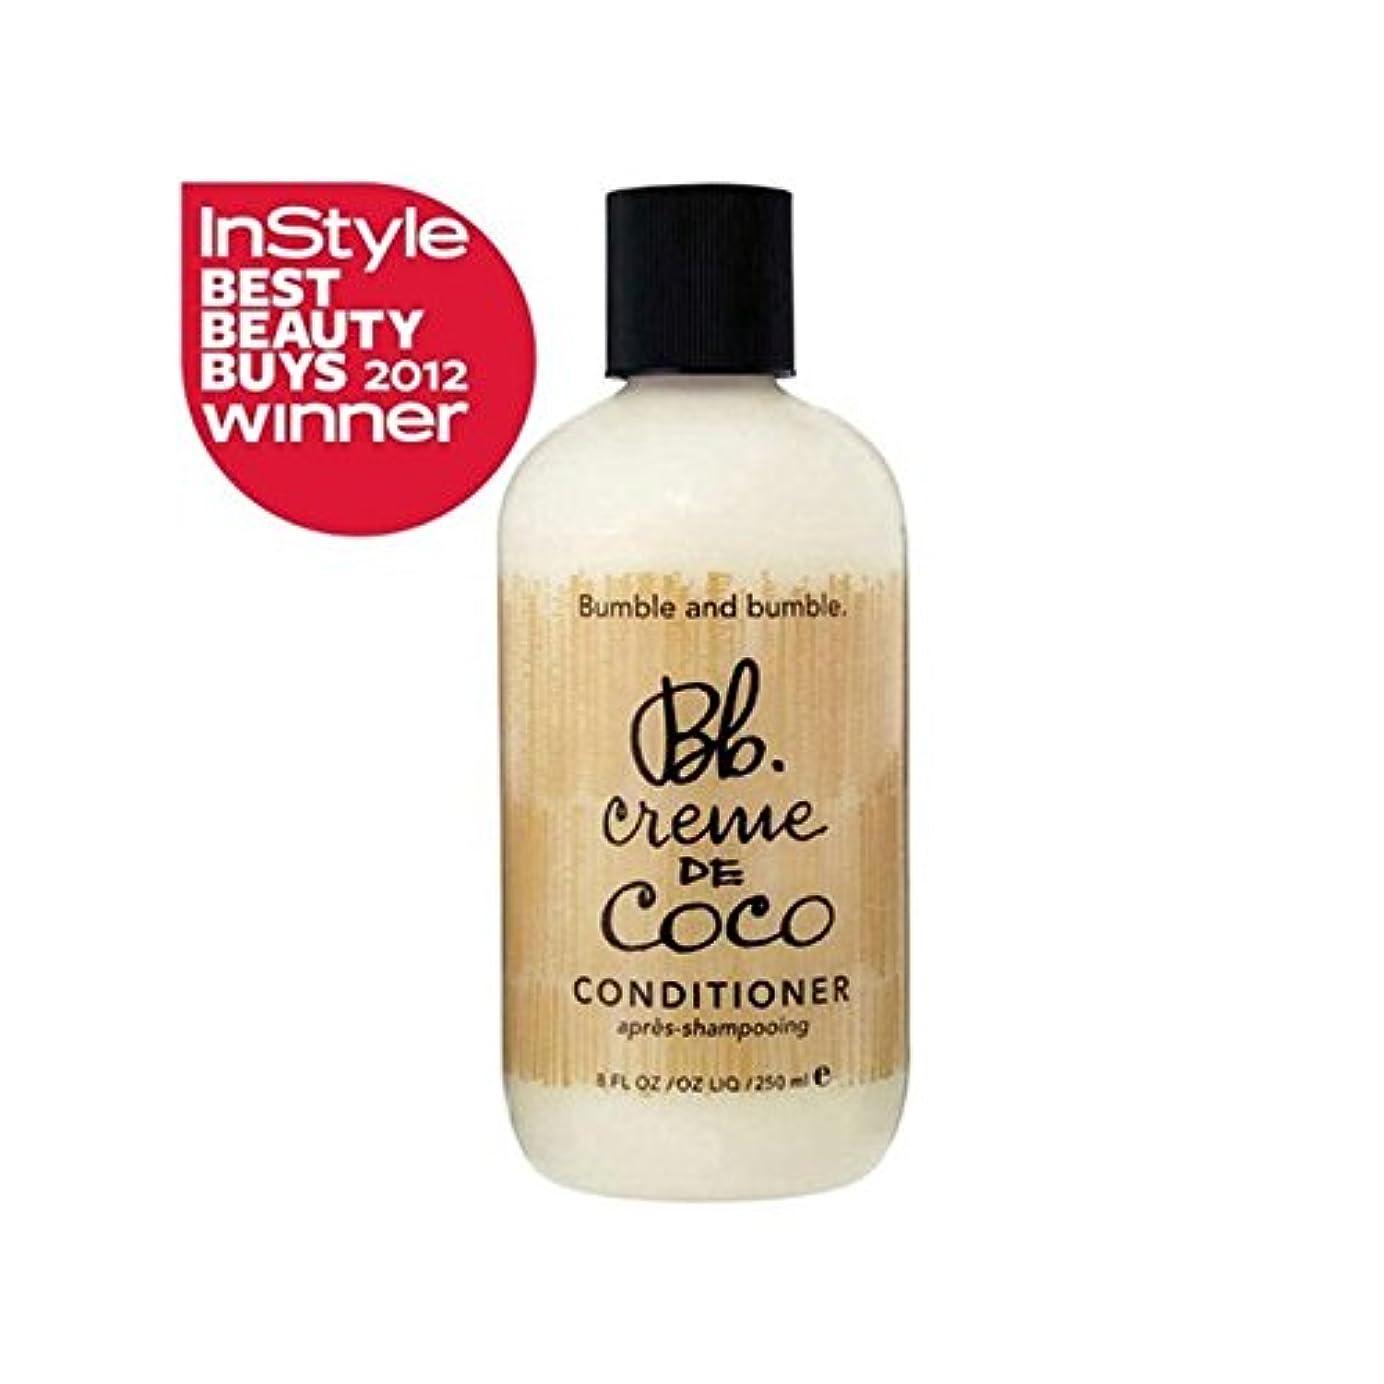 Bb Creme De Coco Conditioner (250ml) (Pack of 6) - クリームデコココンディショナー(250ミリリットル) x6 [並行輸入品]